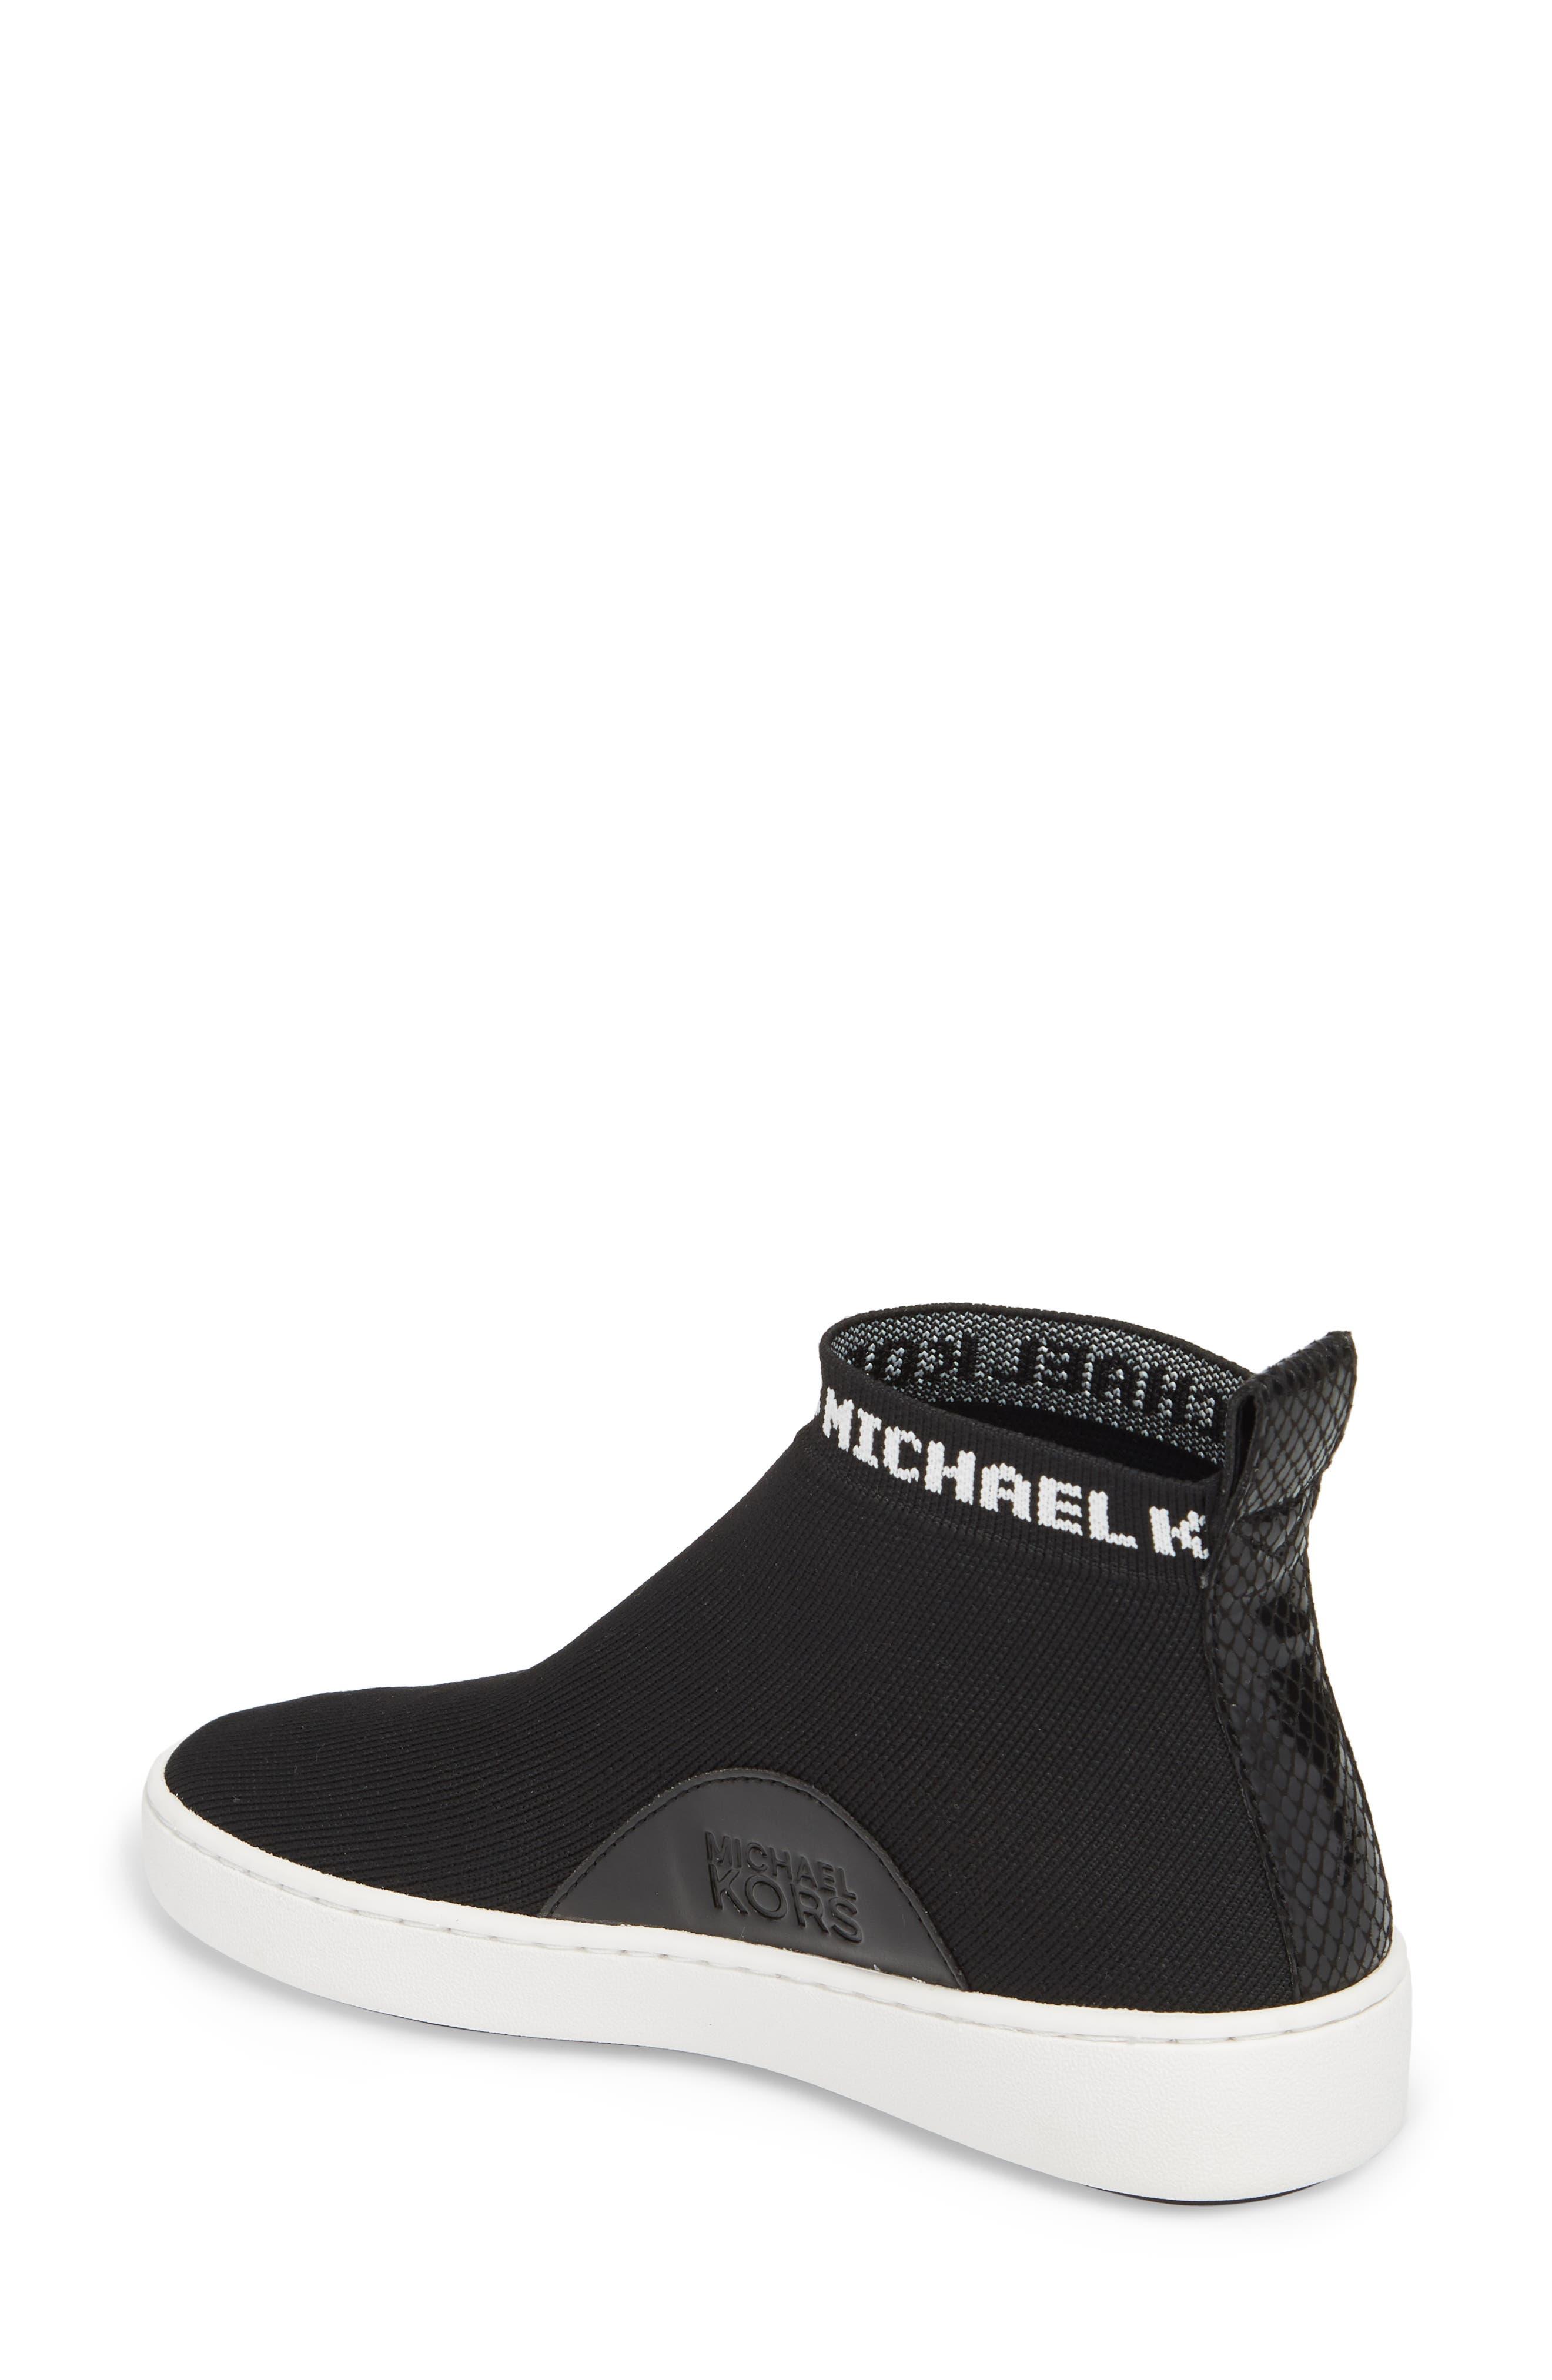 Hilda High Top Sock Sneaker,                             Alternate thumbnail 2, color,